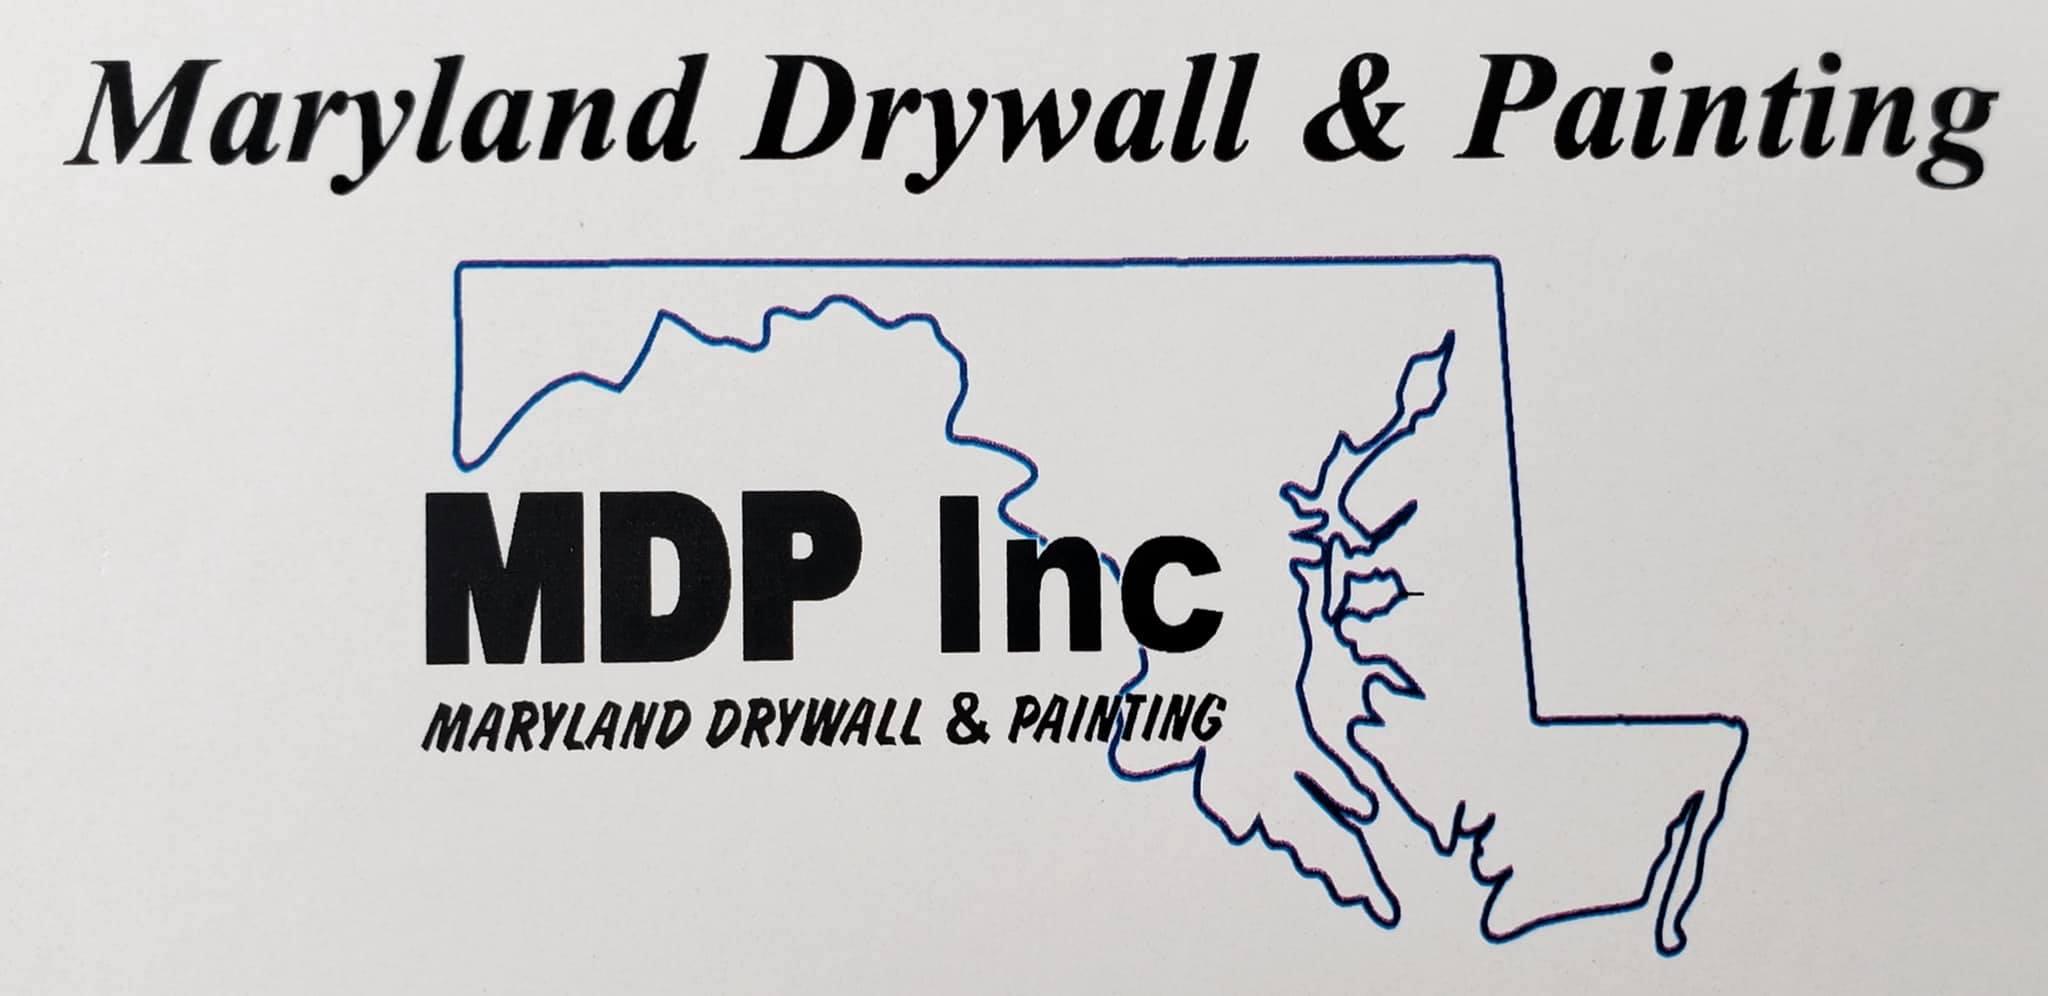 Maryland Drywall & Painting